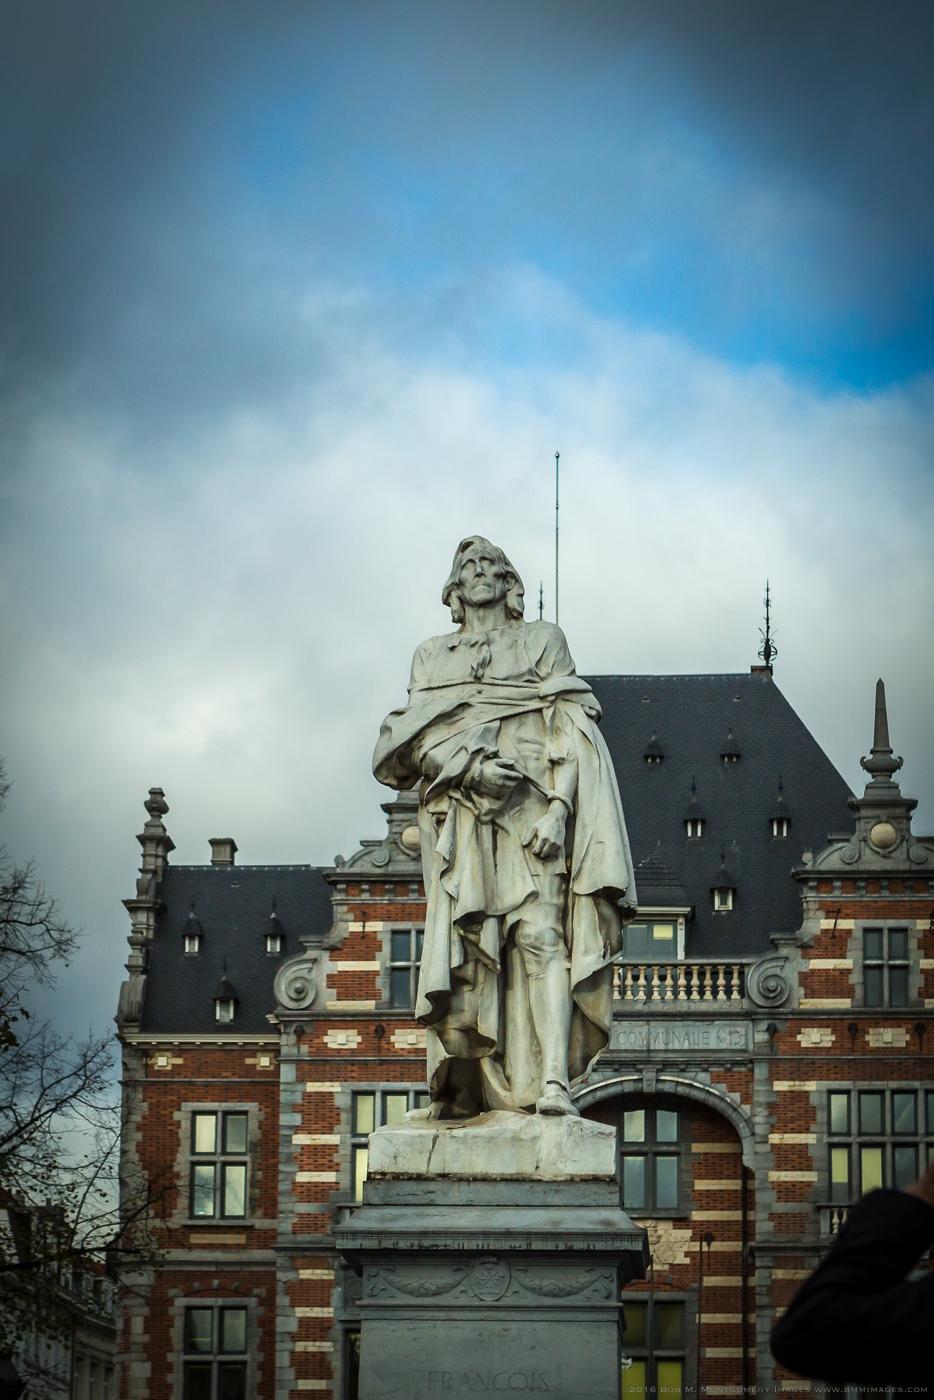 Belgium 20121102 - 0001.jpg